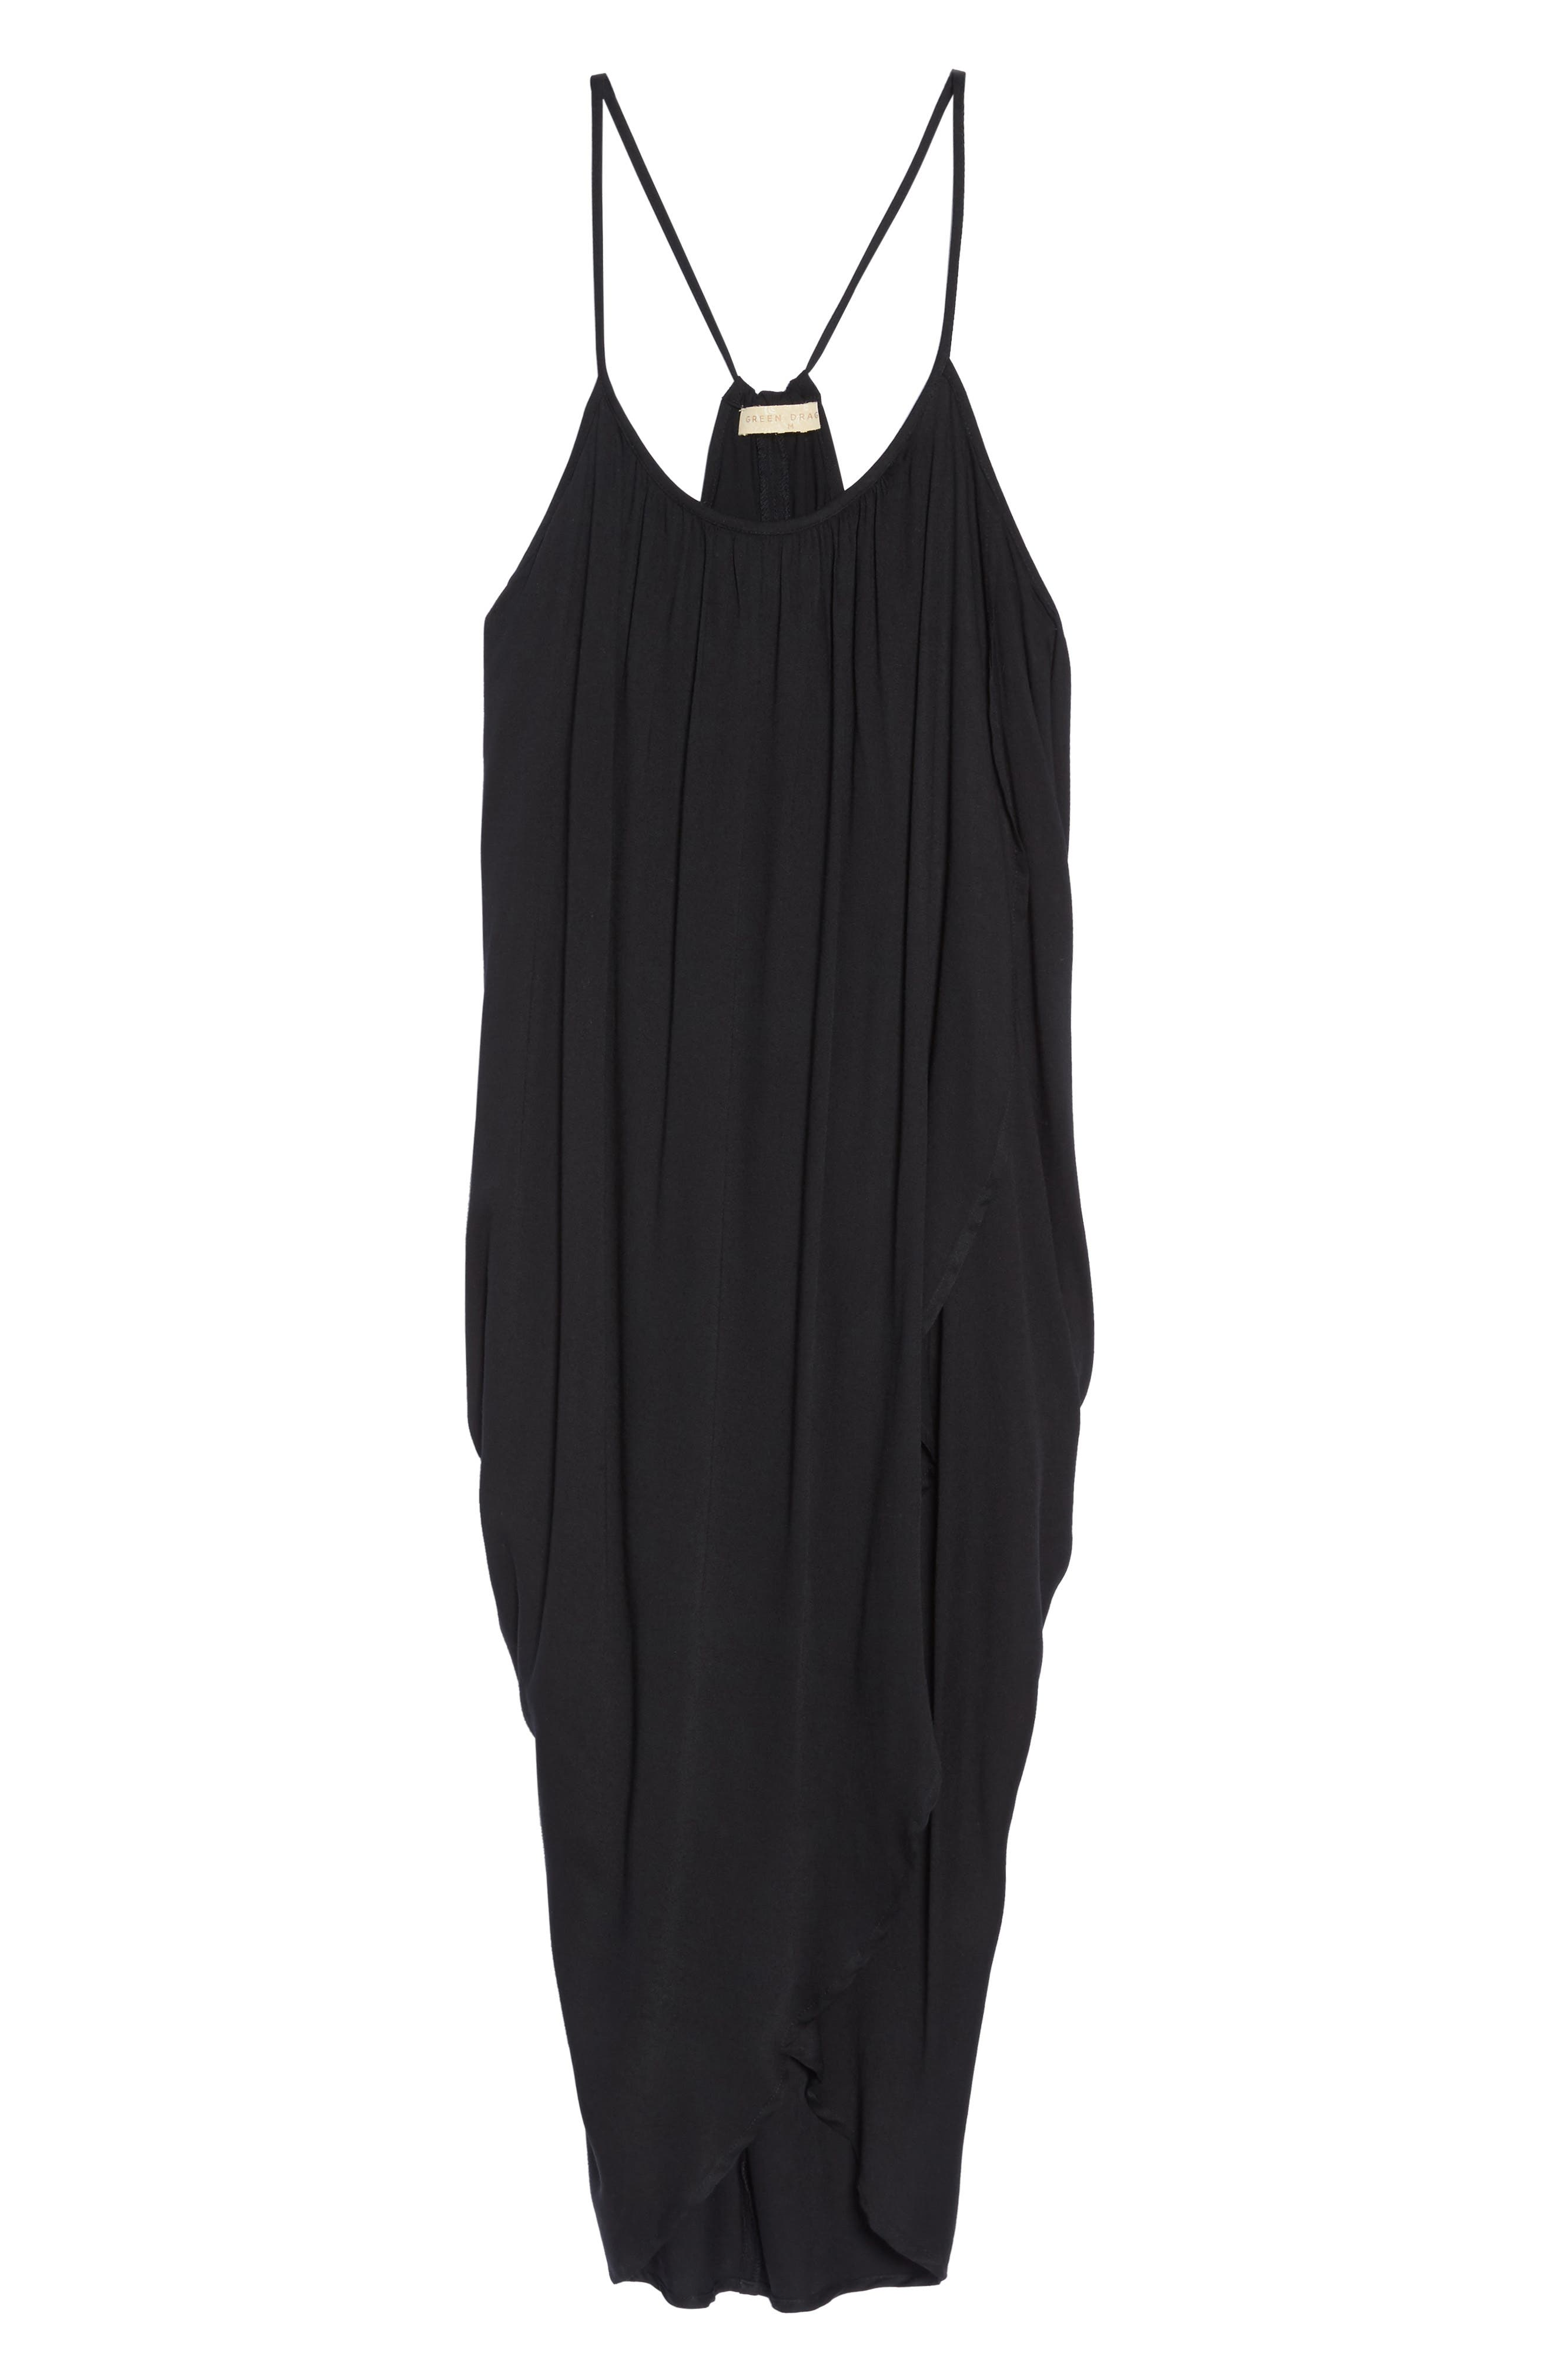 California Core Pali Wrap Cover-Up Dress,                             Alternate thumbnail 6, color,                             Black